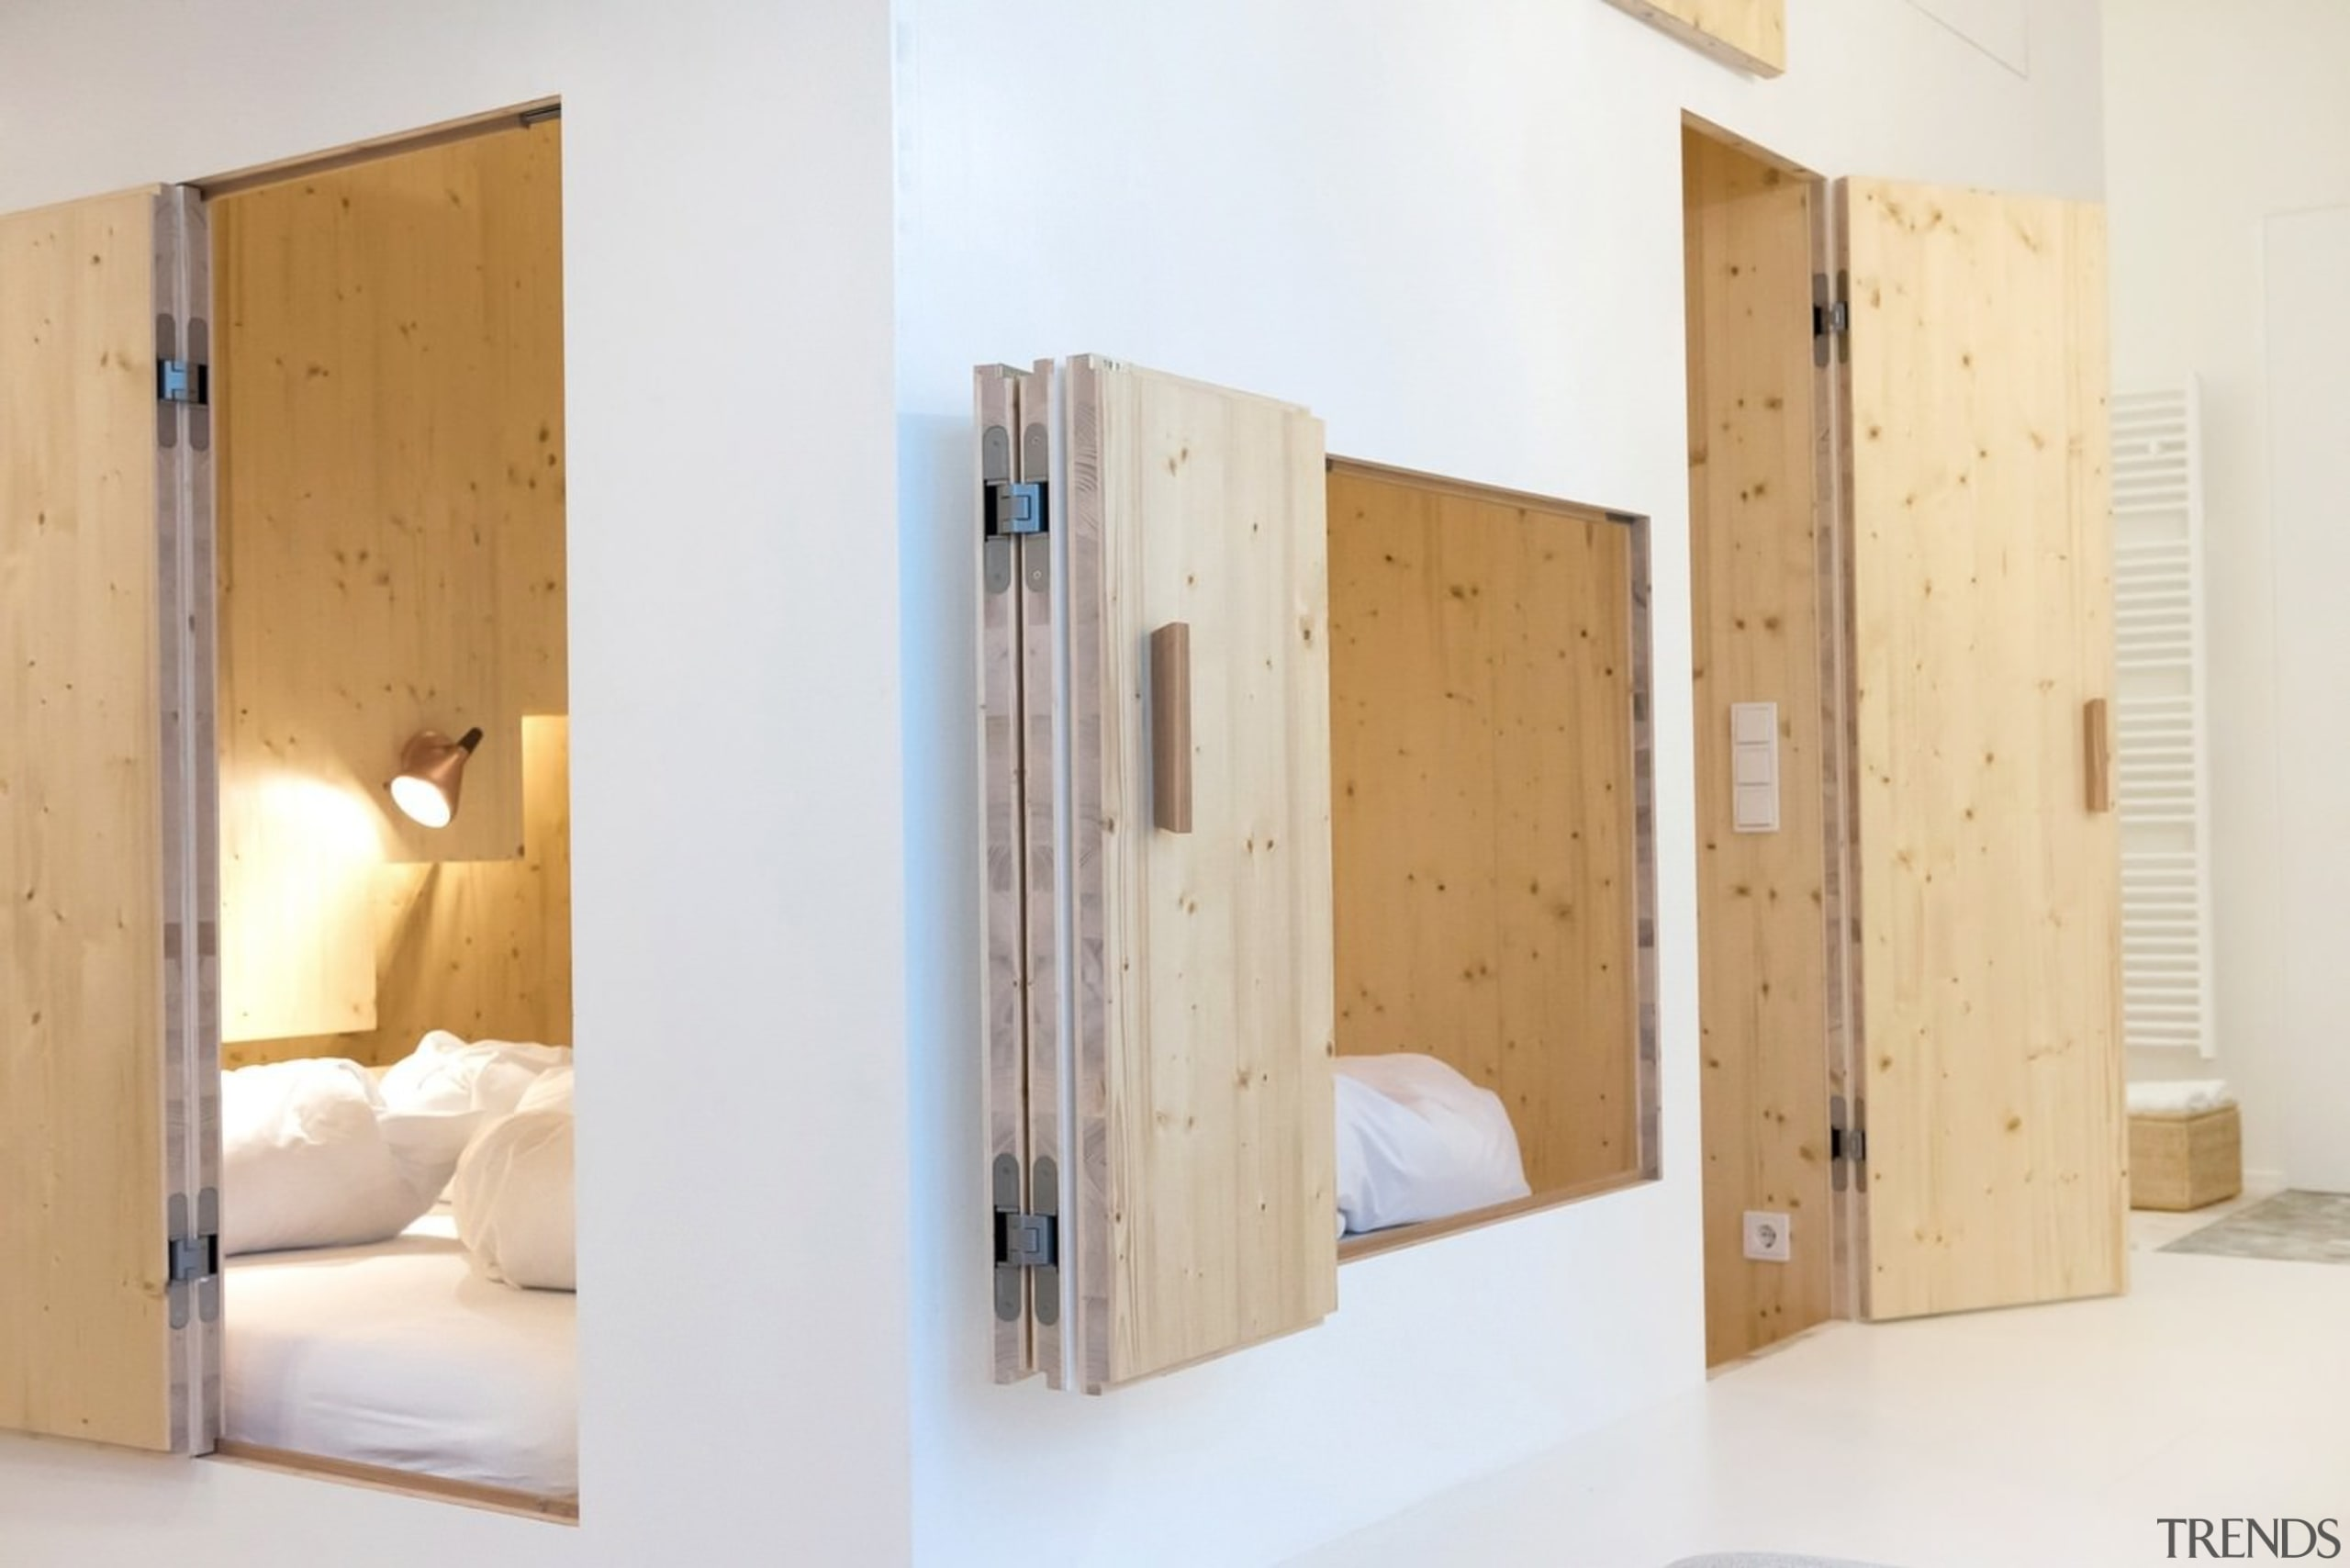 Architect: Sigurd LarsenPhotography by Rita Lino, James bed, door, furniture, product, product design, room, wall, wardrobe, wood, white, orange